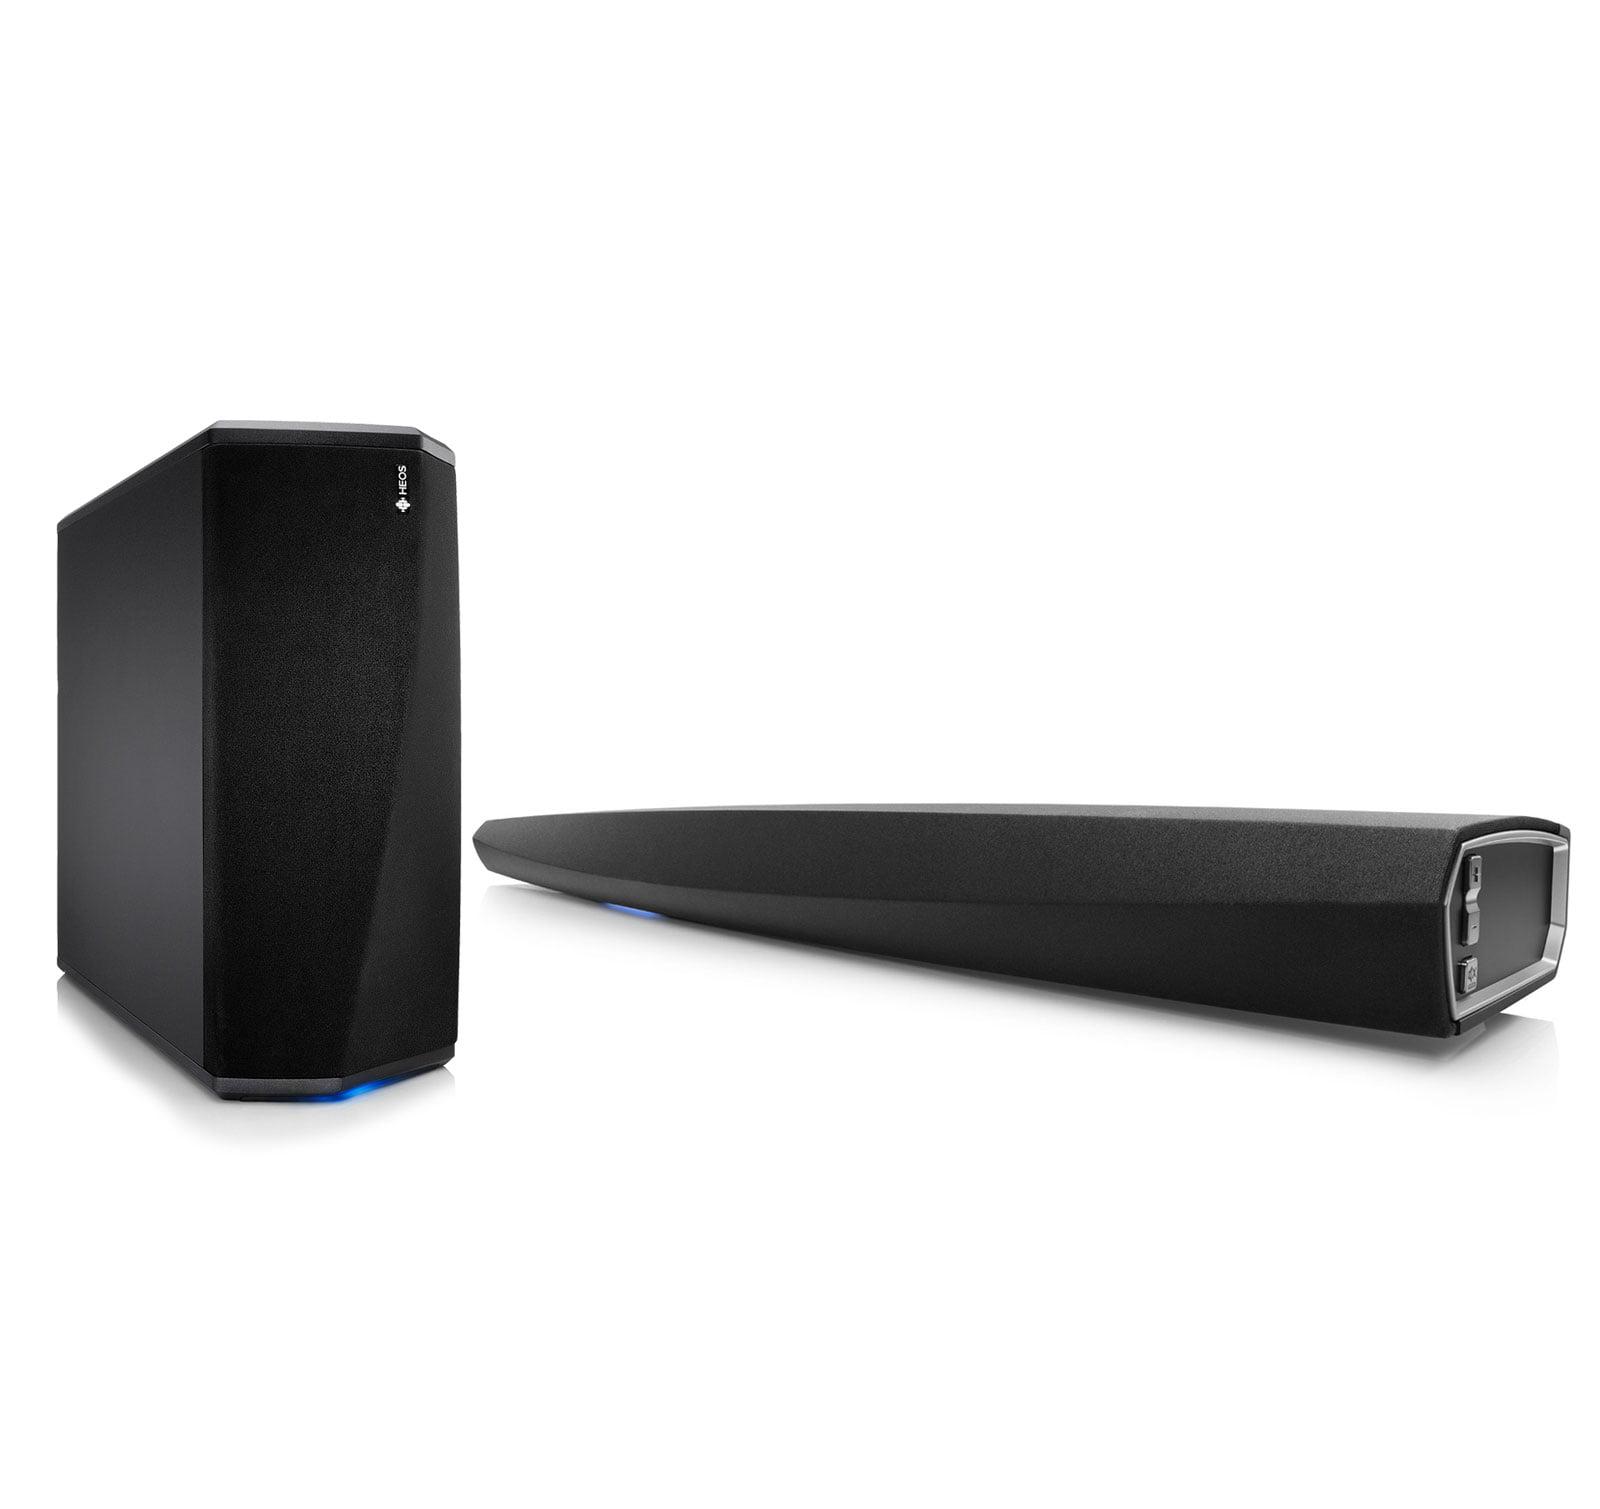 Denon HEOS BAR Soundbar with WiFi & Denon HEOS SUBWOOFER Wireless Subwoofer Kit by Denon